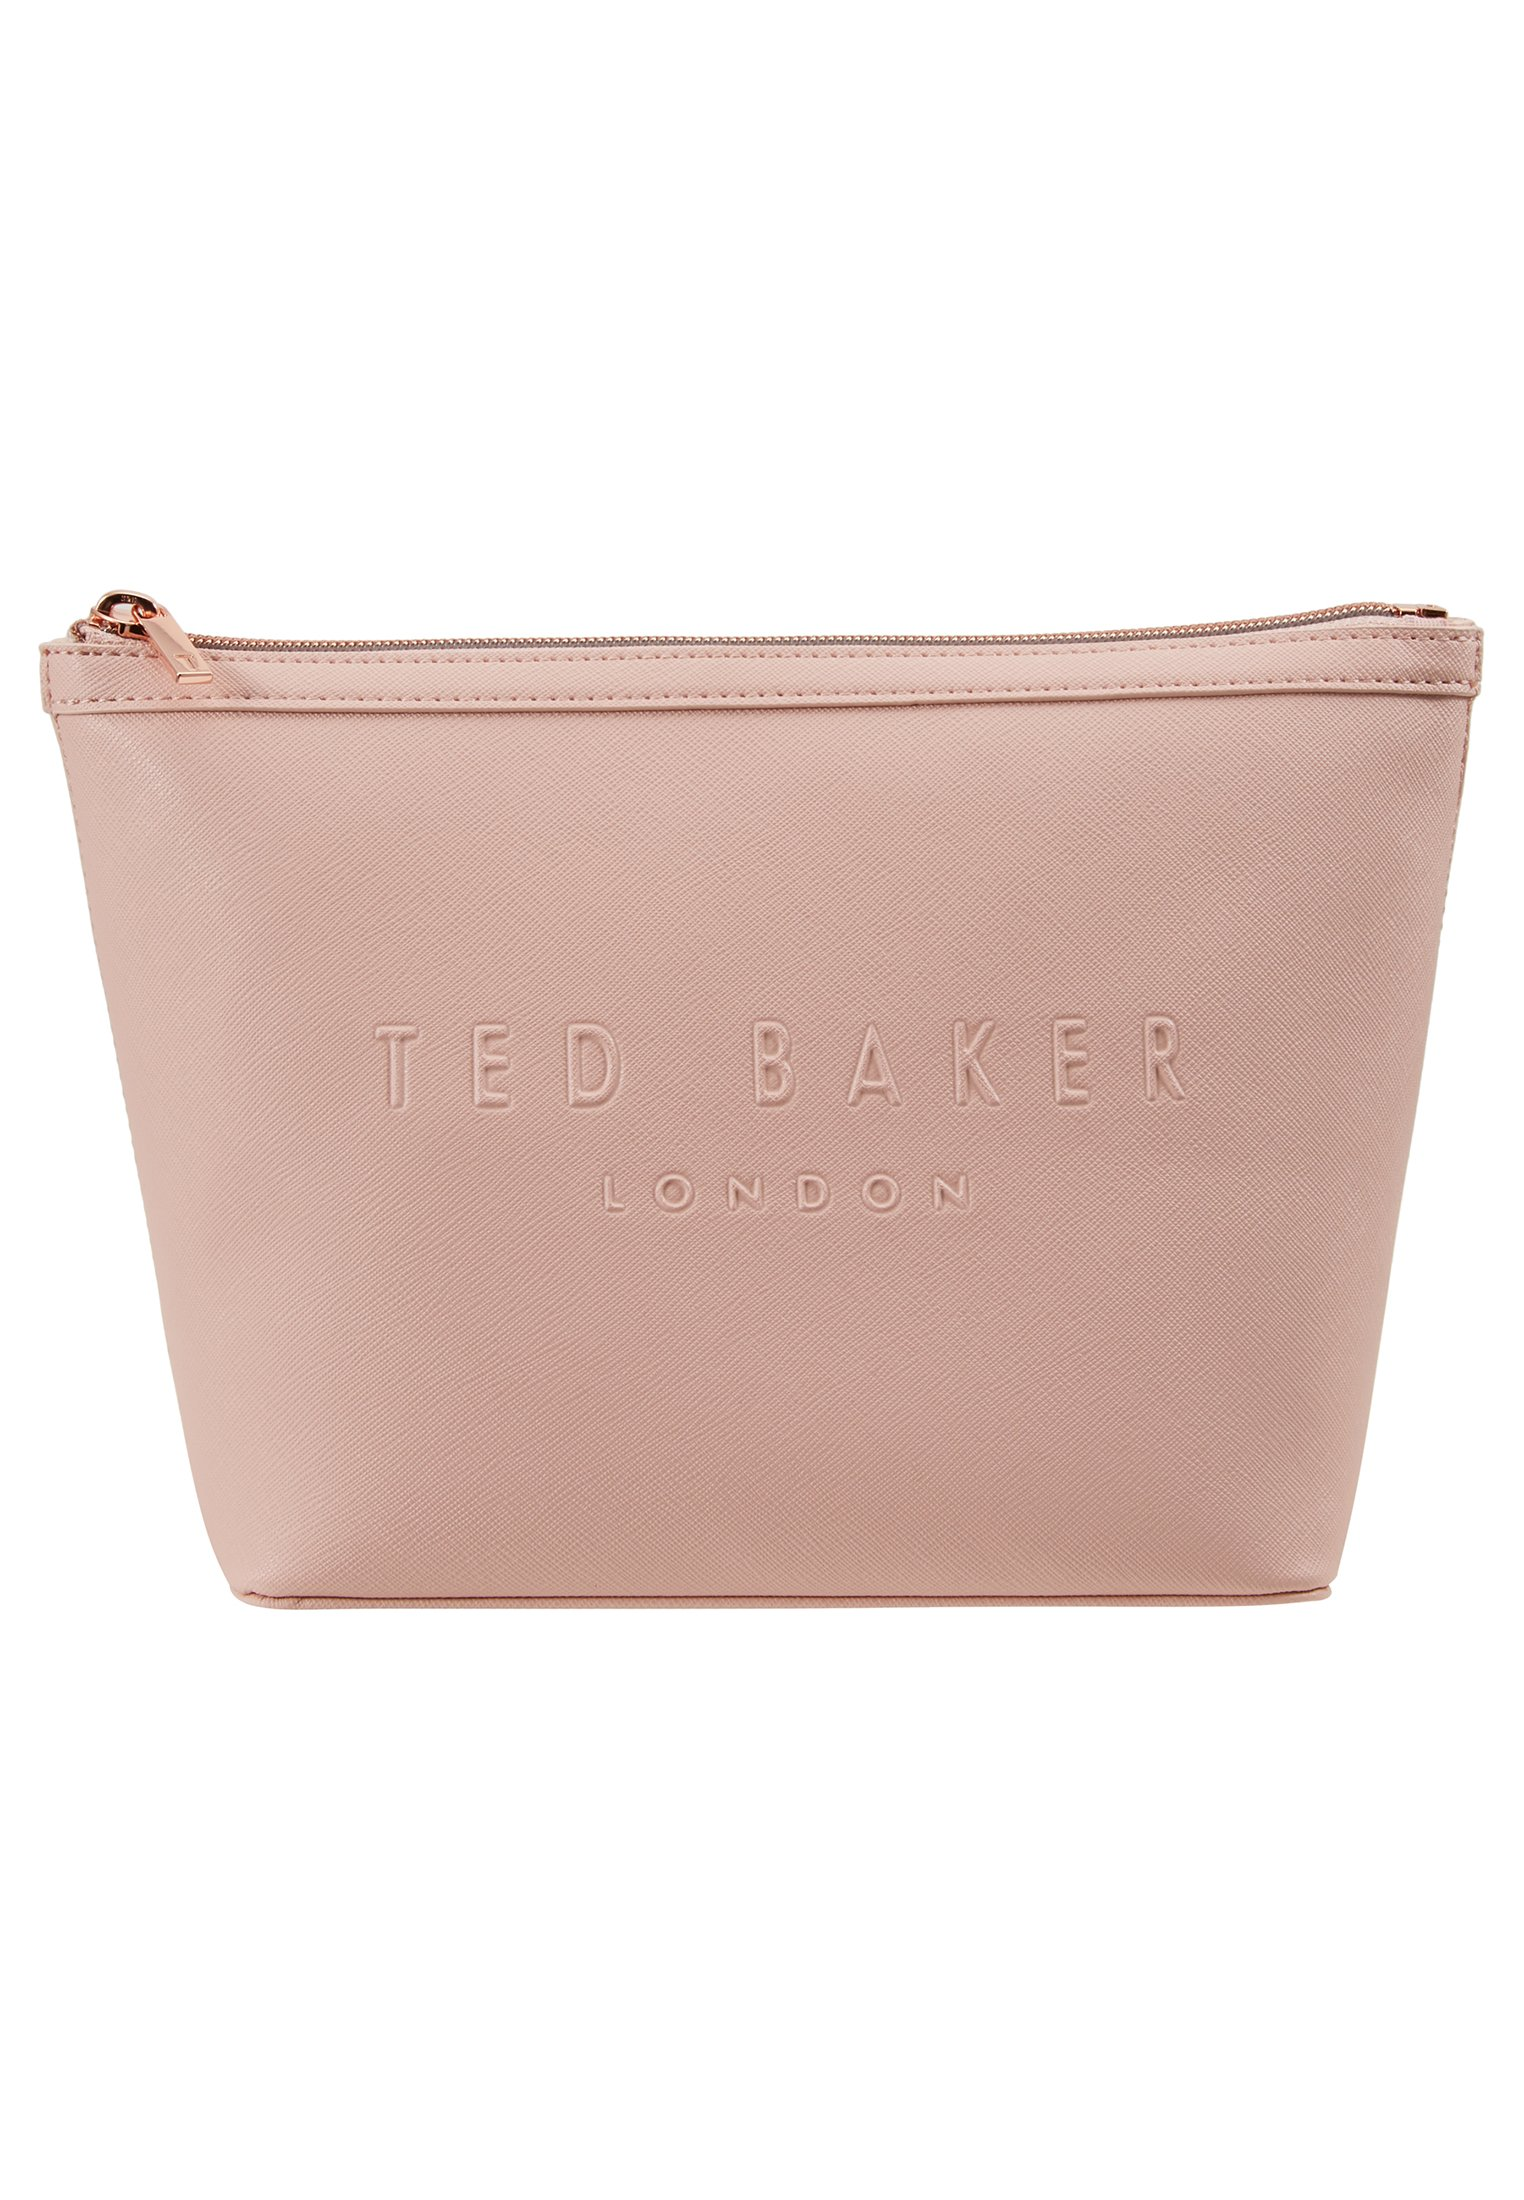 Ted Baker Nance - Necessär Pink